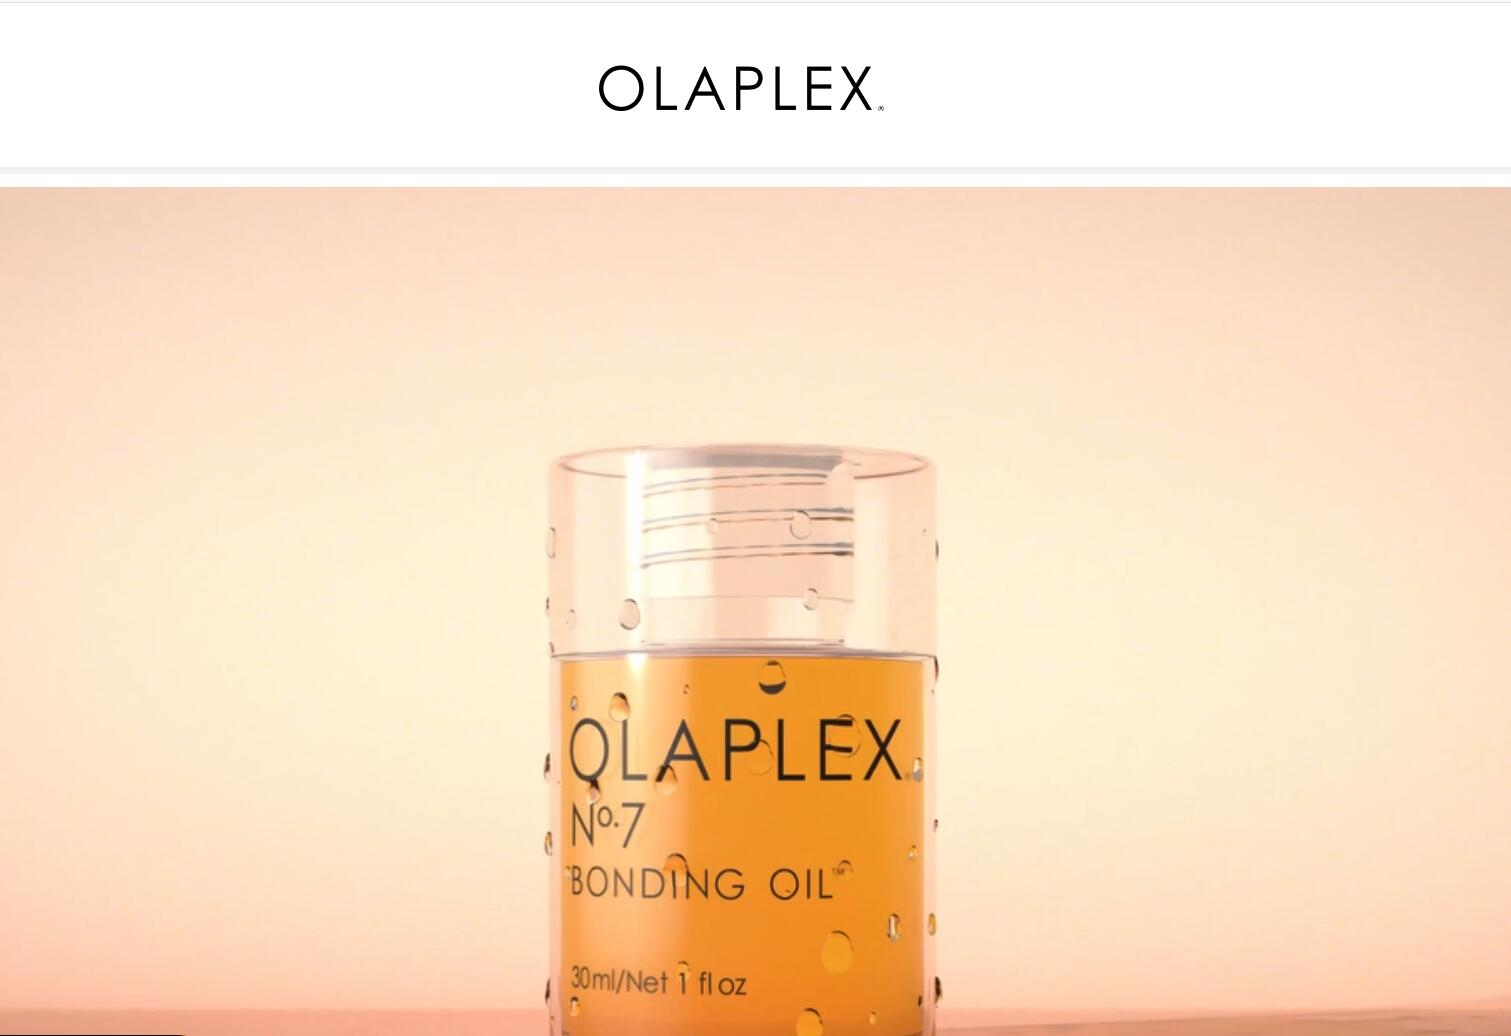 L'Oréal 美国公司专利侵权案败诉,或将向创业公司 Olaplex 支付超1亿美元赔偿金